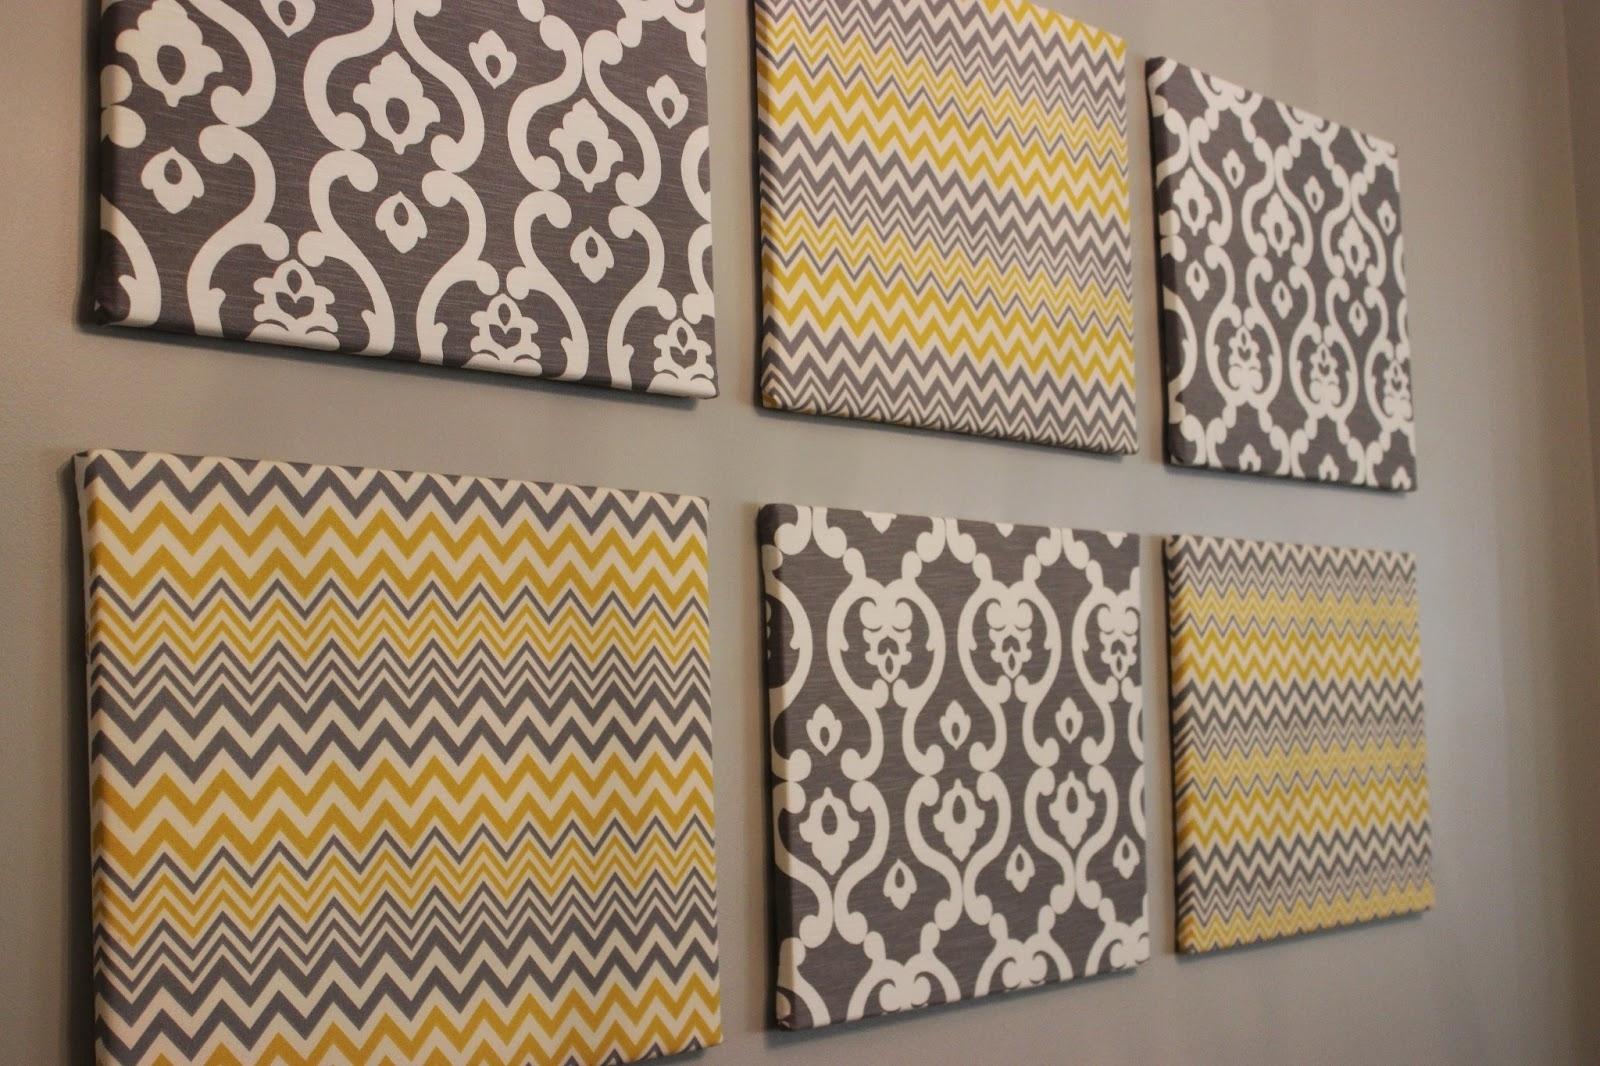 Fabric Butterfly Wall Art Inside Latest Art: Canvas Wall Art Diy (View 3 of 15)